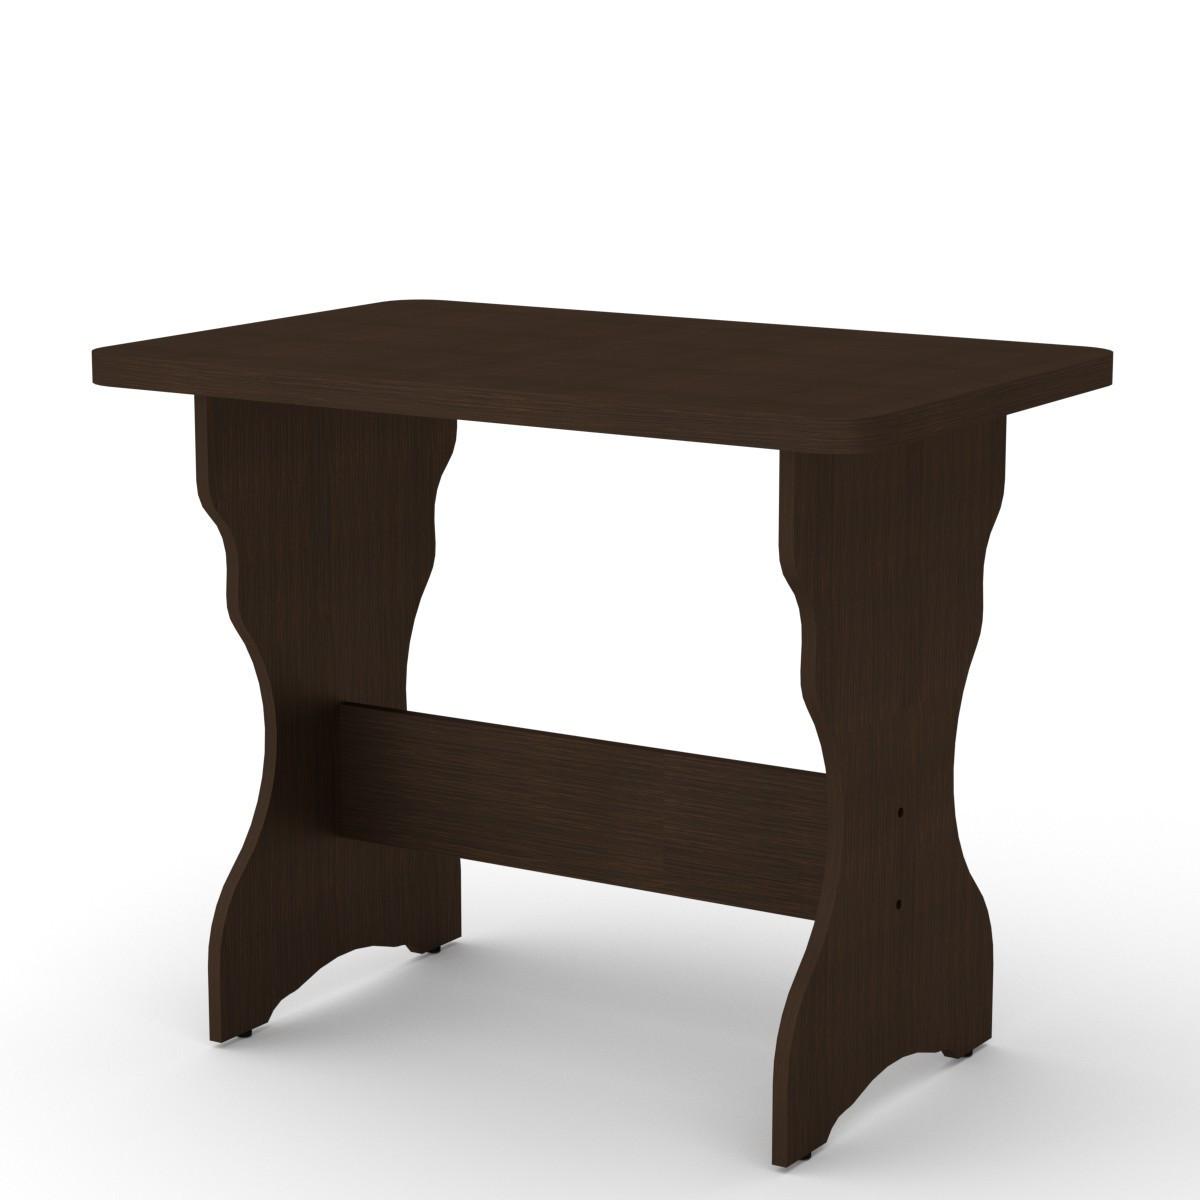 Стол кухонный КС-3 венге темный Компанит (90х60х72 см)